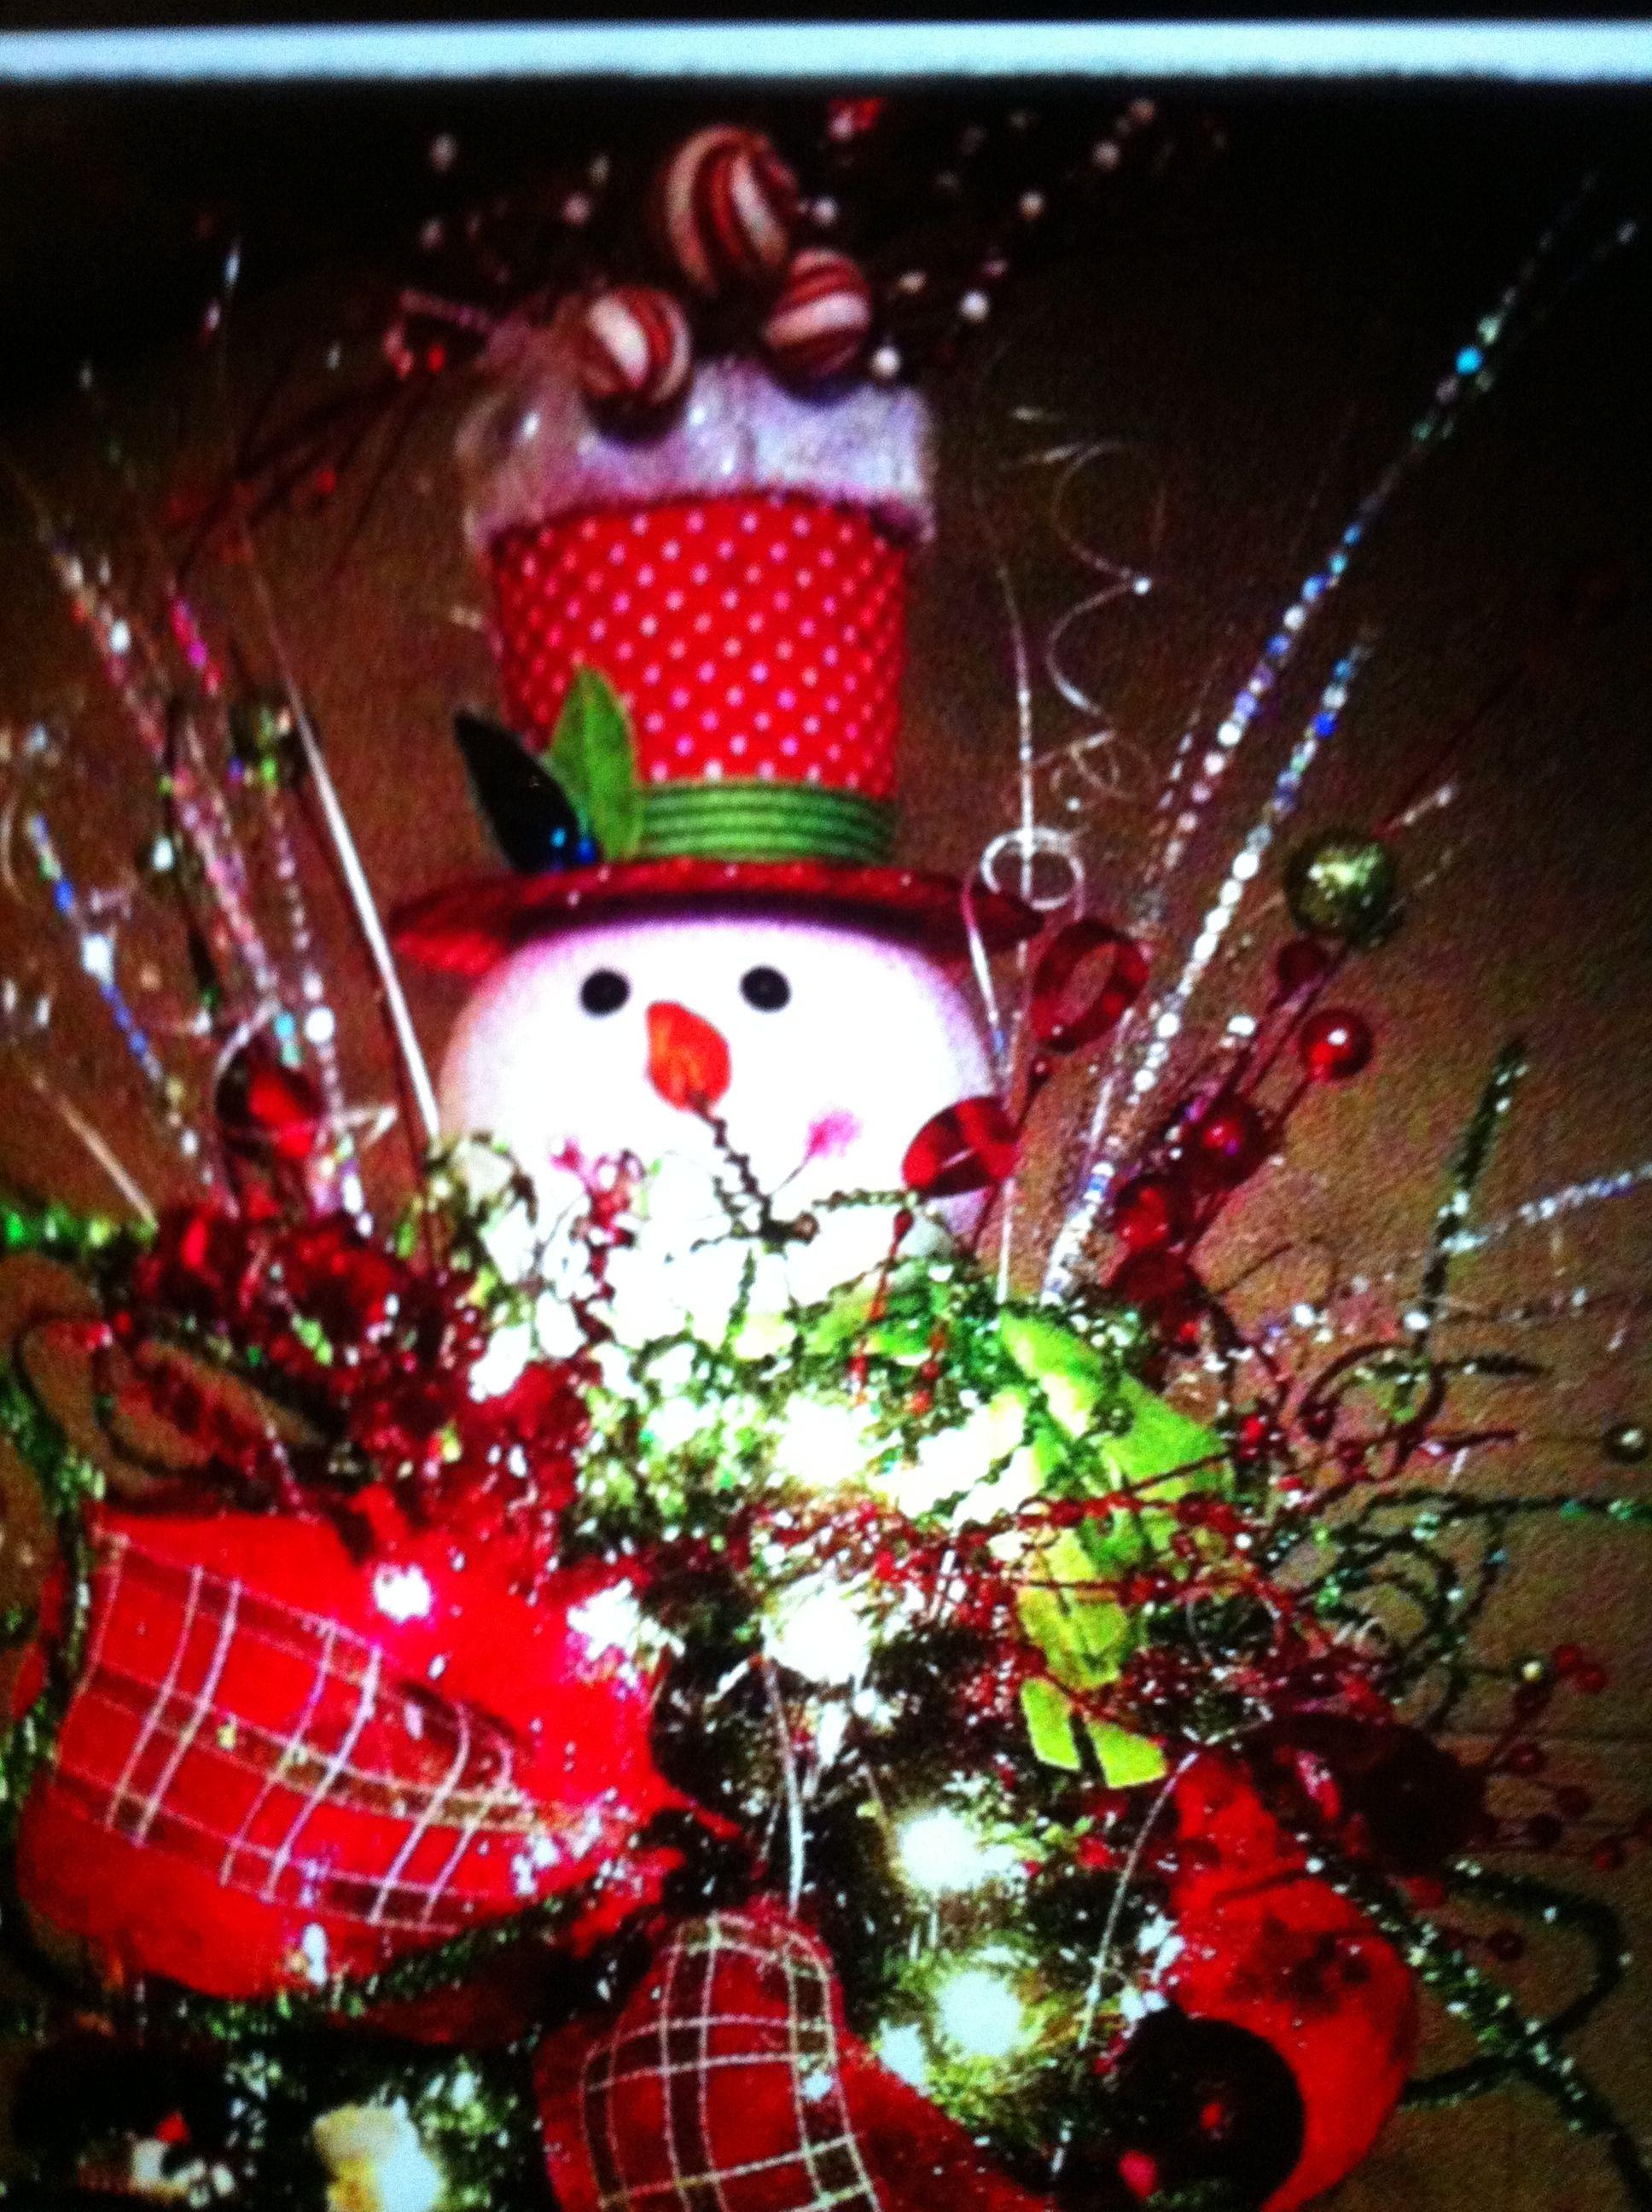 Snowman Tree Topper Holiday Decor Christmas Xmas Decorations Xmas Ornaments